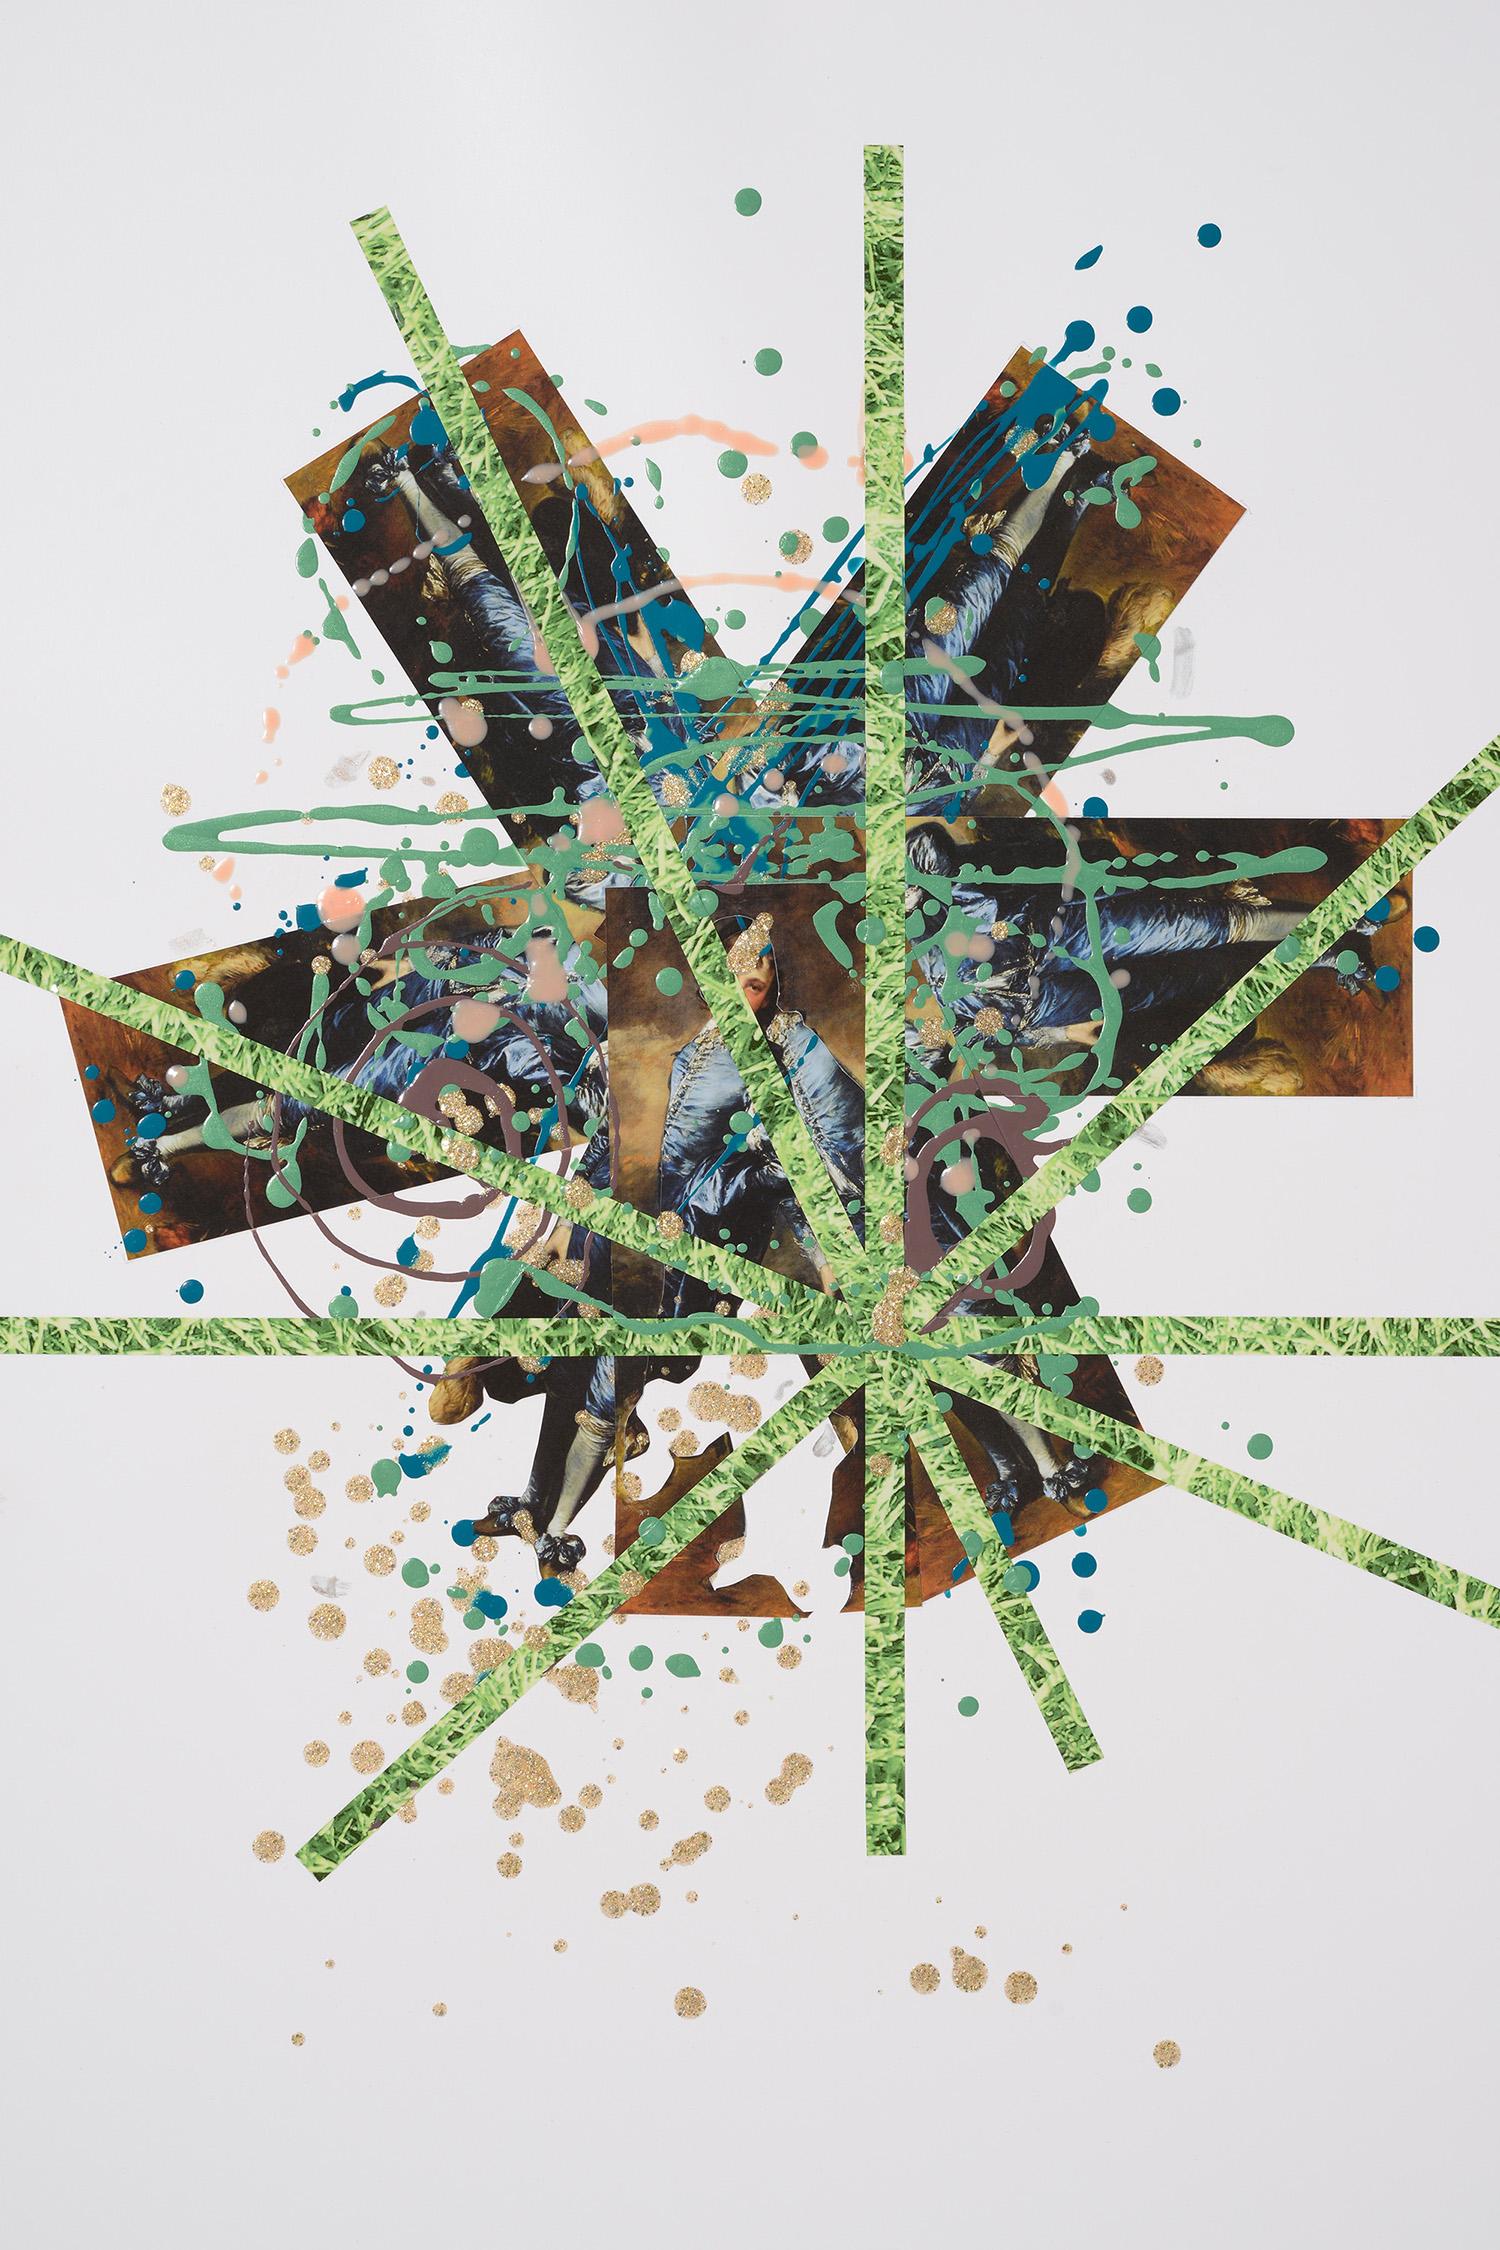 Markues, ItΓÇÖs Golden, 2014, mixed media on paper, 60 x 40 cm.jpg